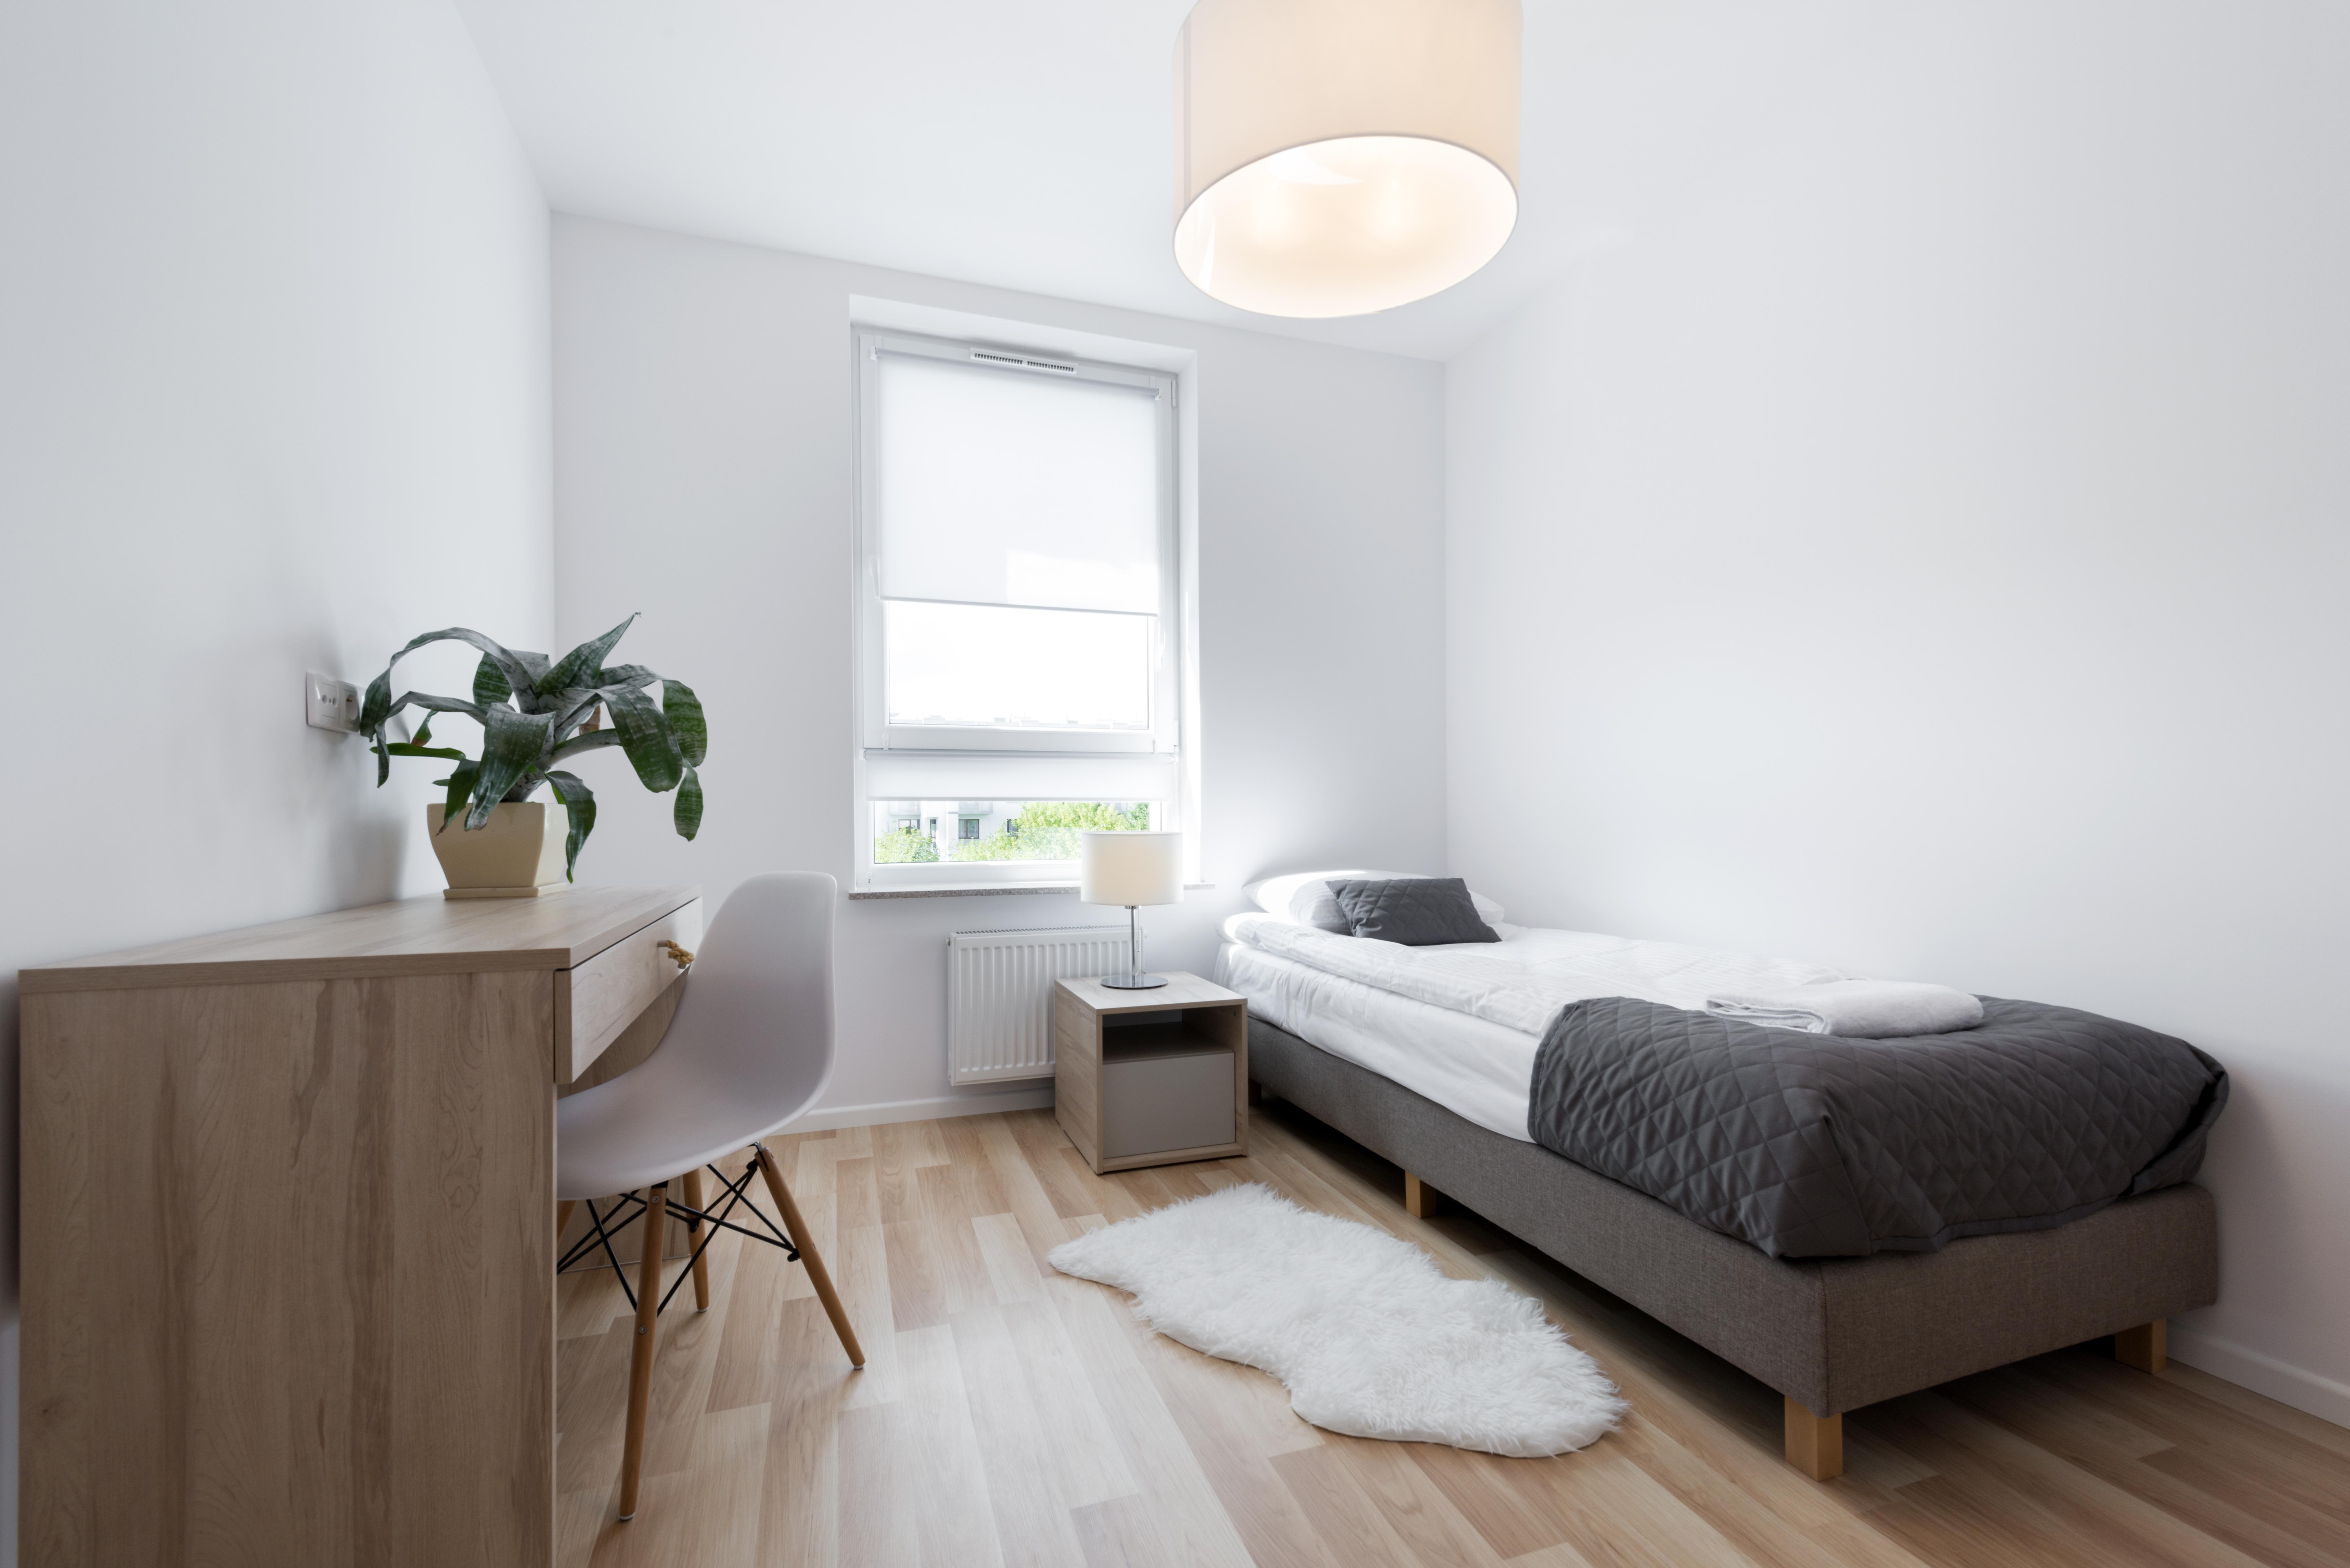 apartment-VCG.jpg